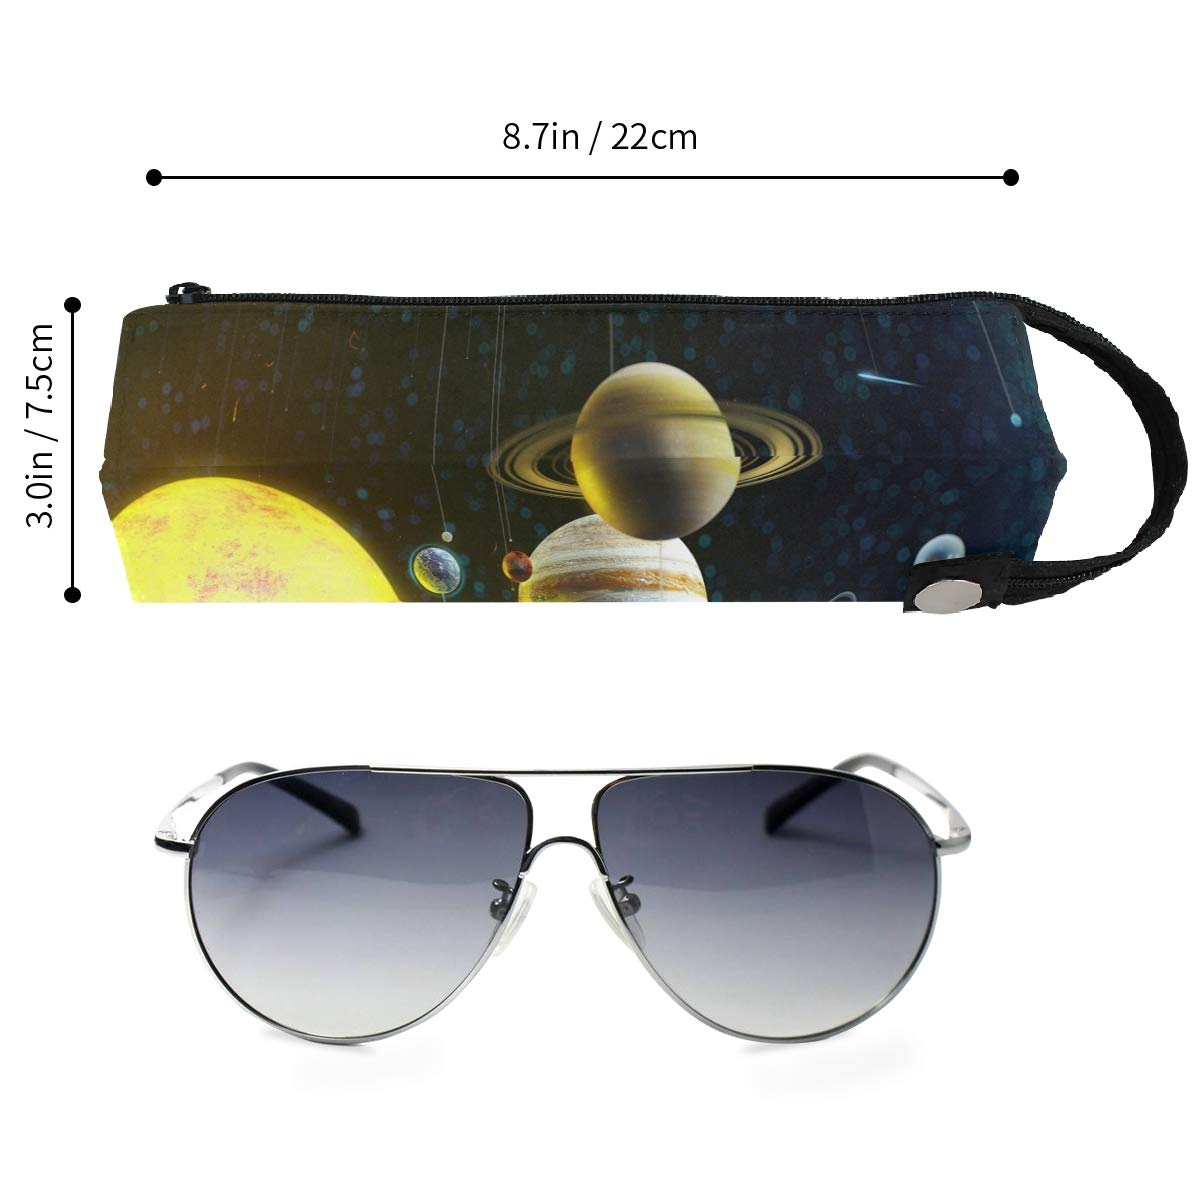 Pandas Wallpaper Glasses Case Portable Soft Sunglasses Ball Pen Bag Protective Box